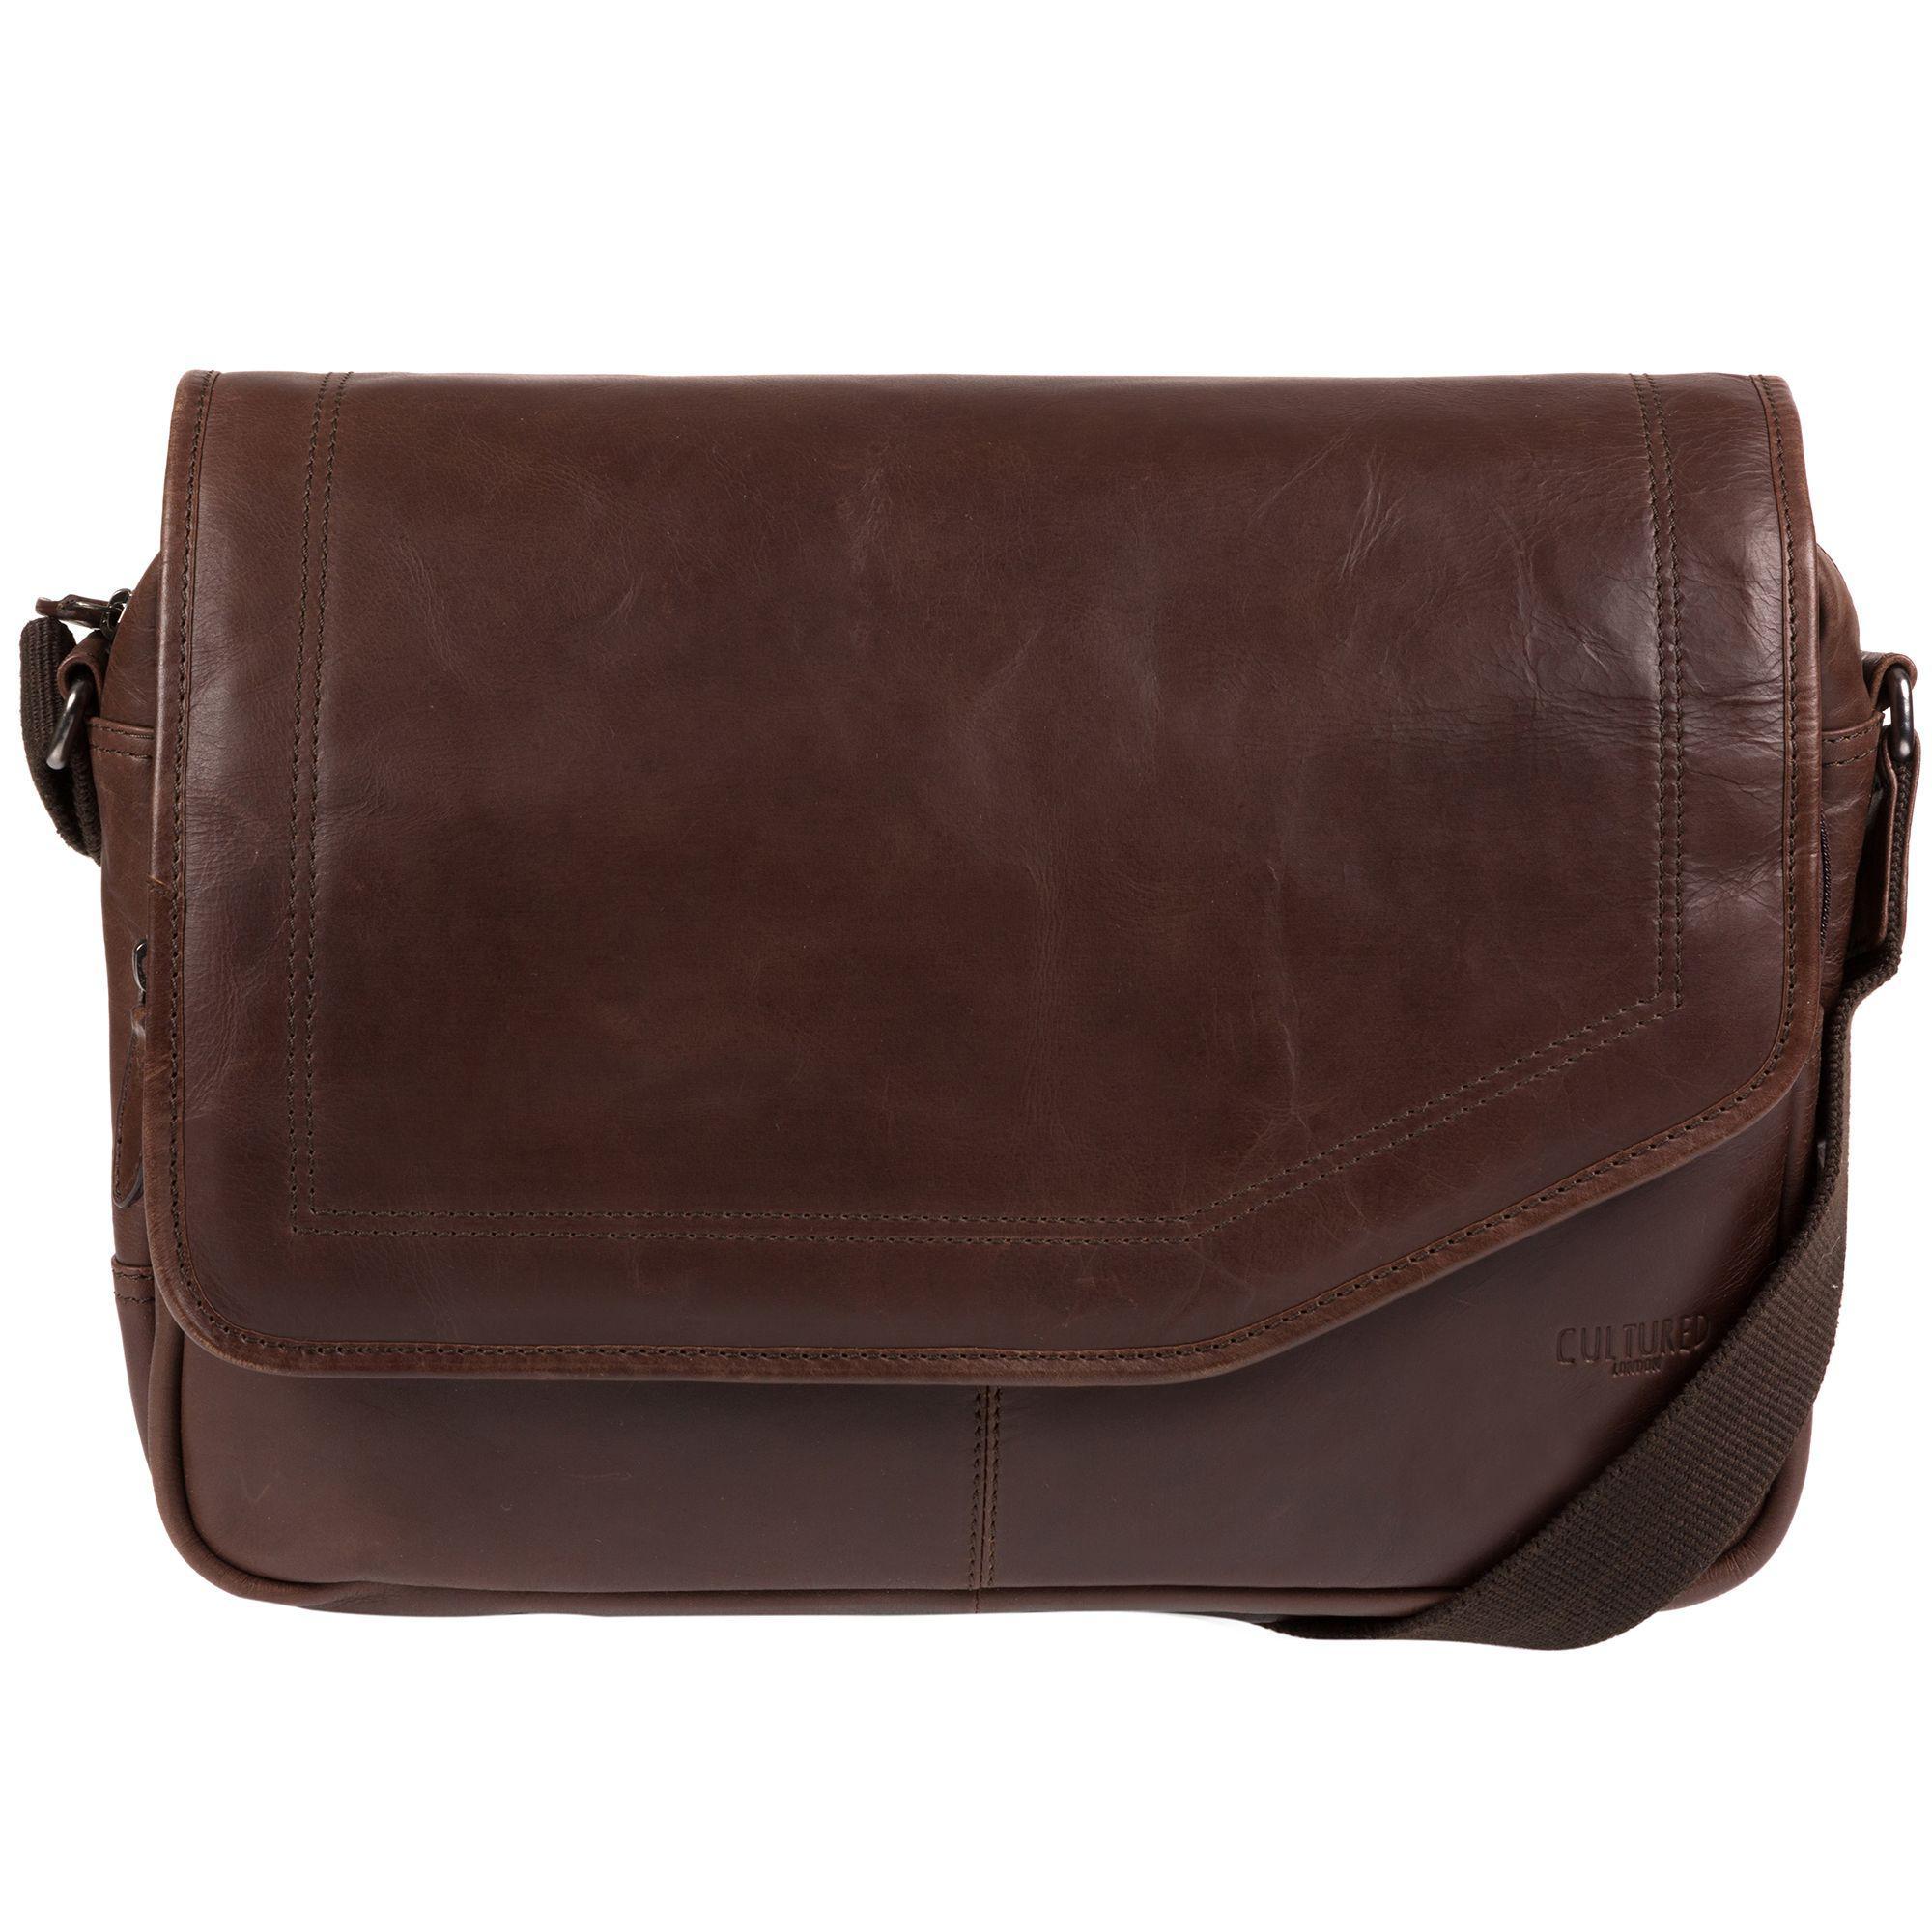 Cultured London Dark Brown  reaction  Natural Leather Messenger Bag ... 111e68836a20f